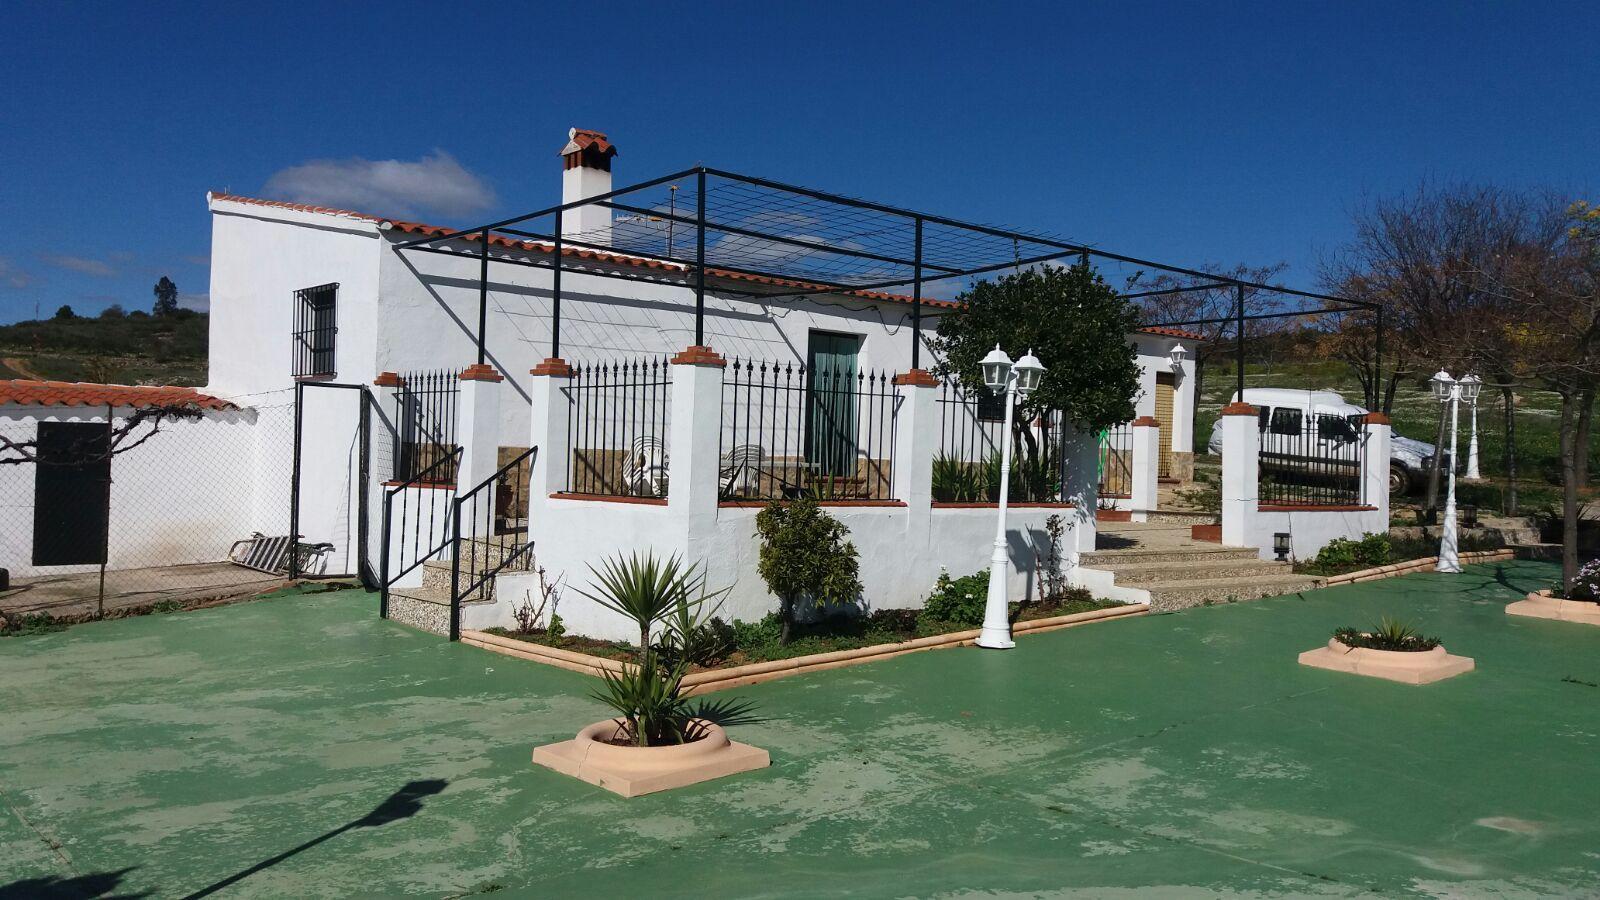 Alquiler de casa rural guadalcanal sierra norte de for Alquiler de casas en cantillana sevilla